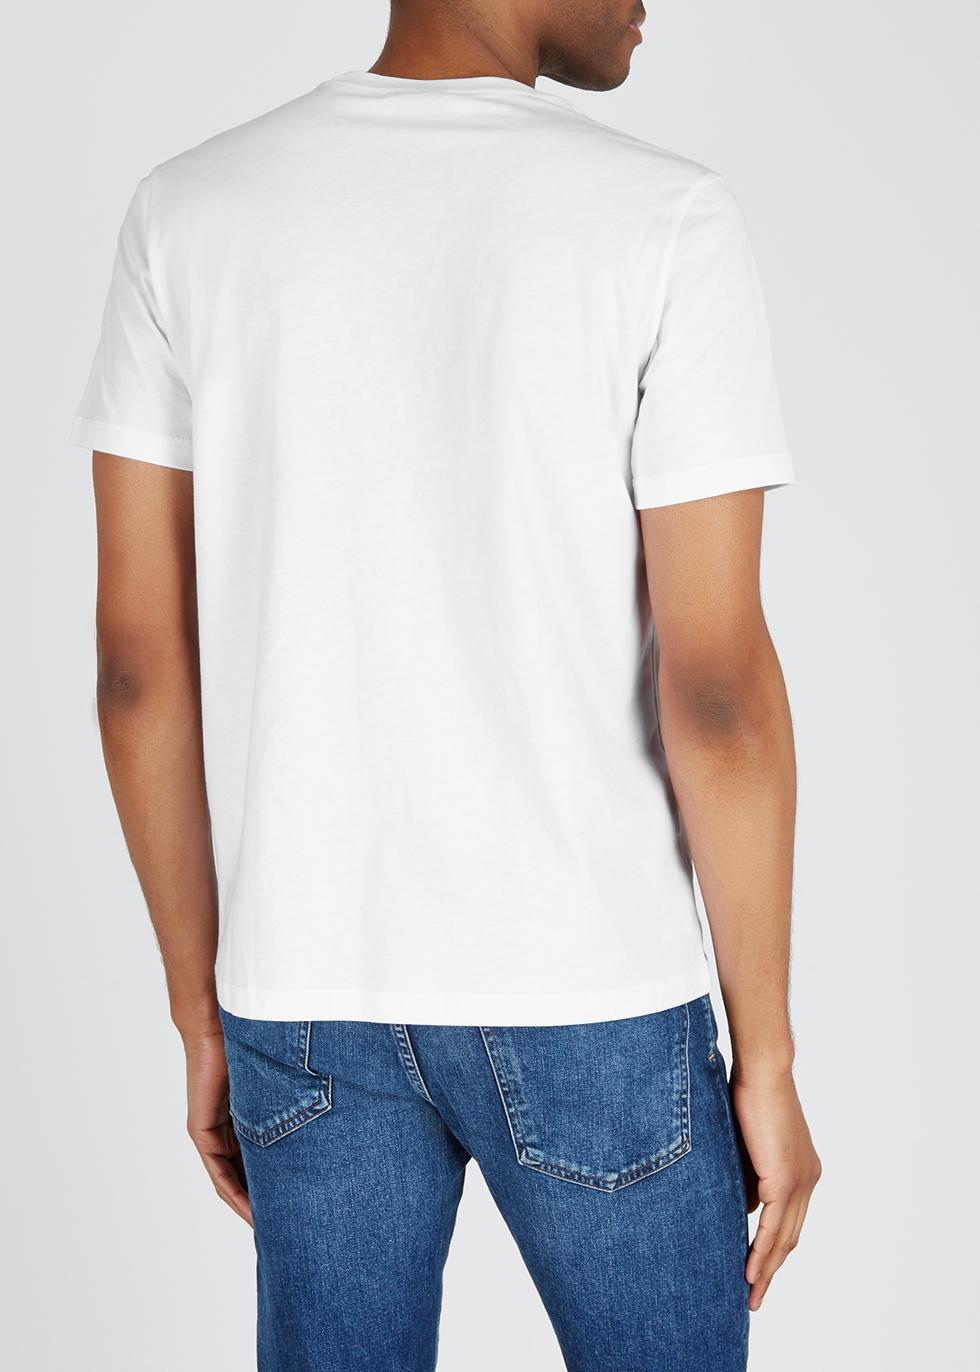 White printed cotton T-shirt - Paul Smith